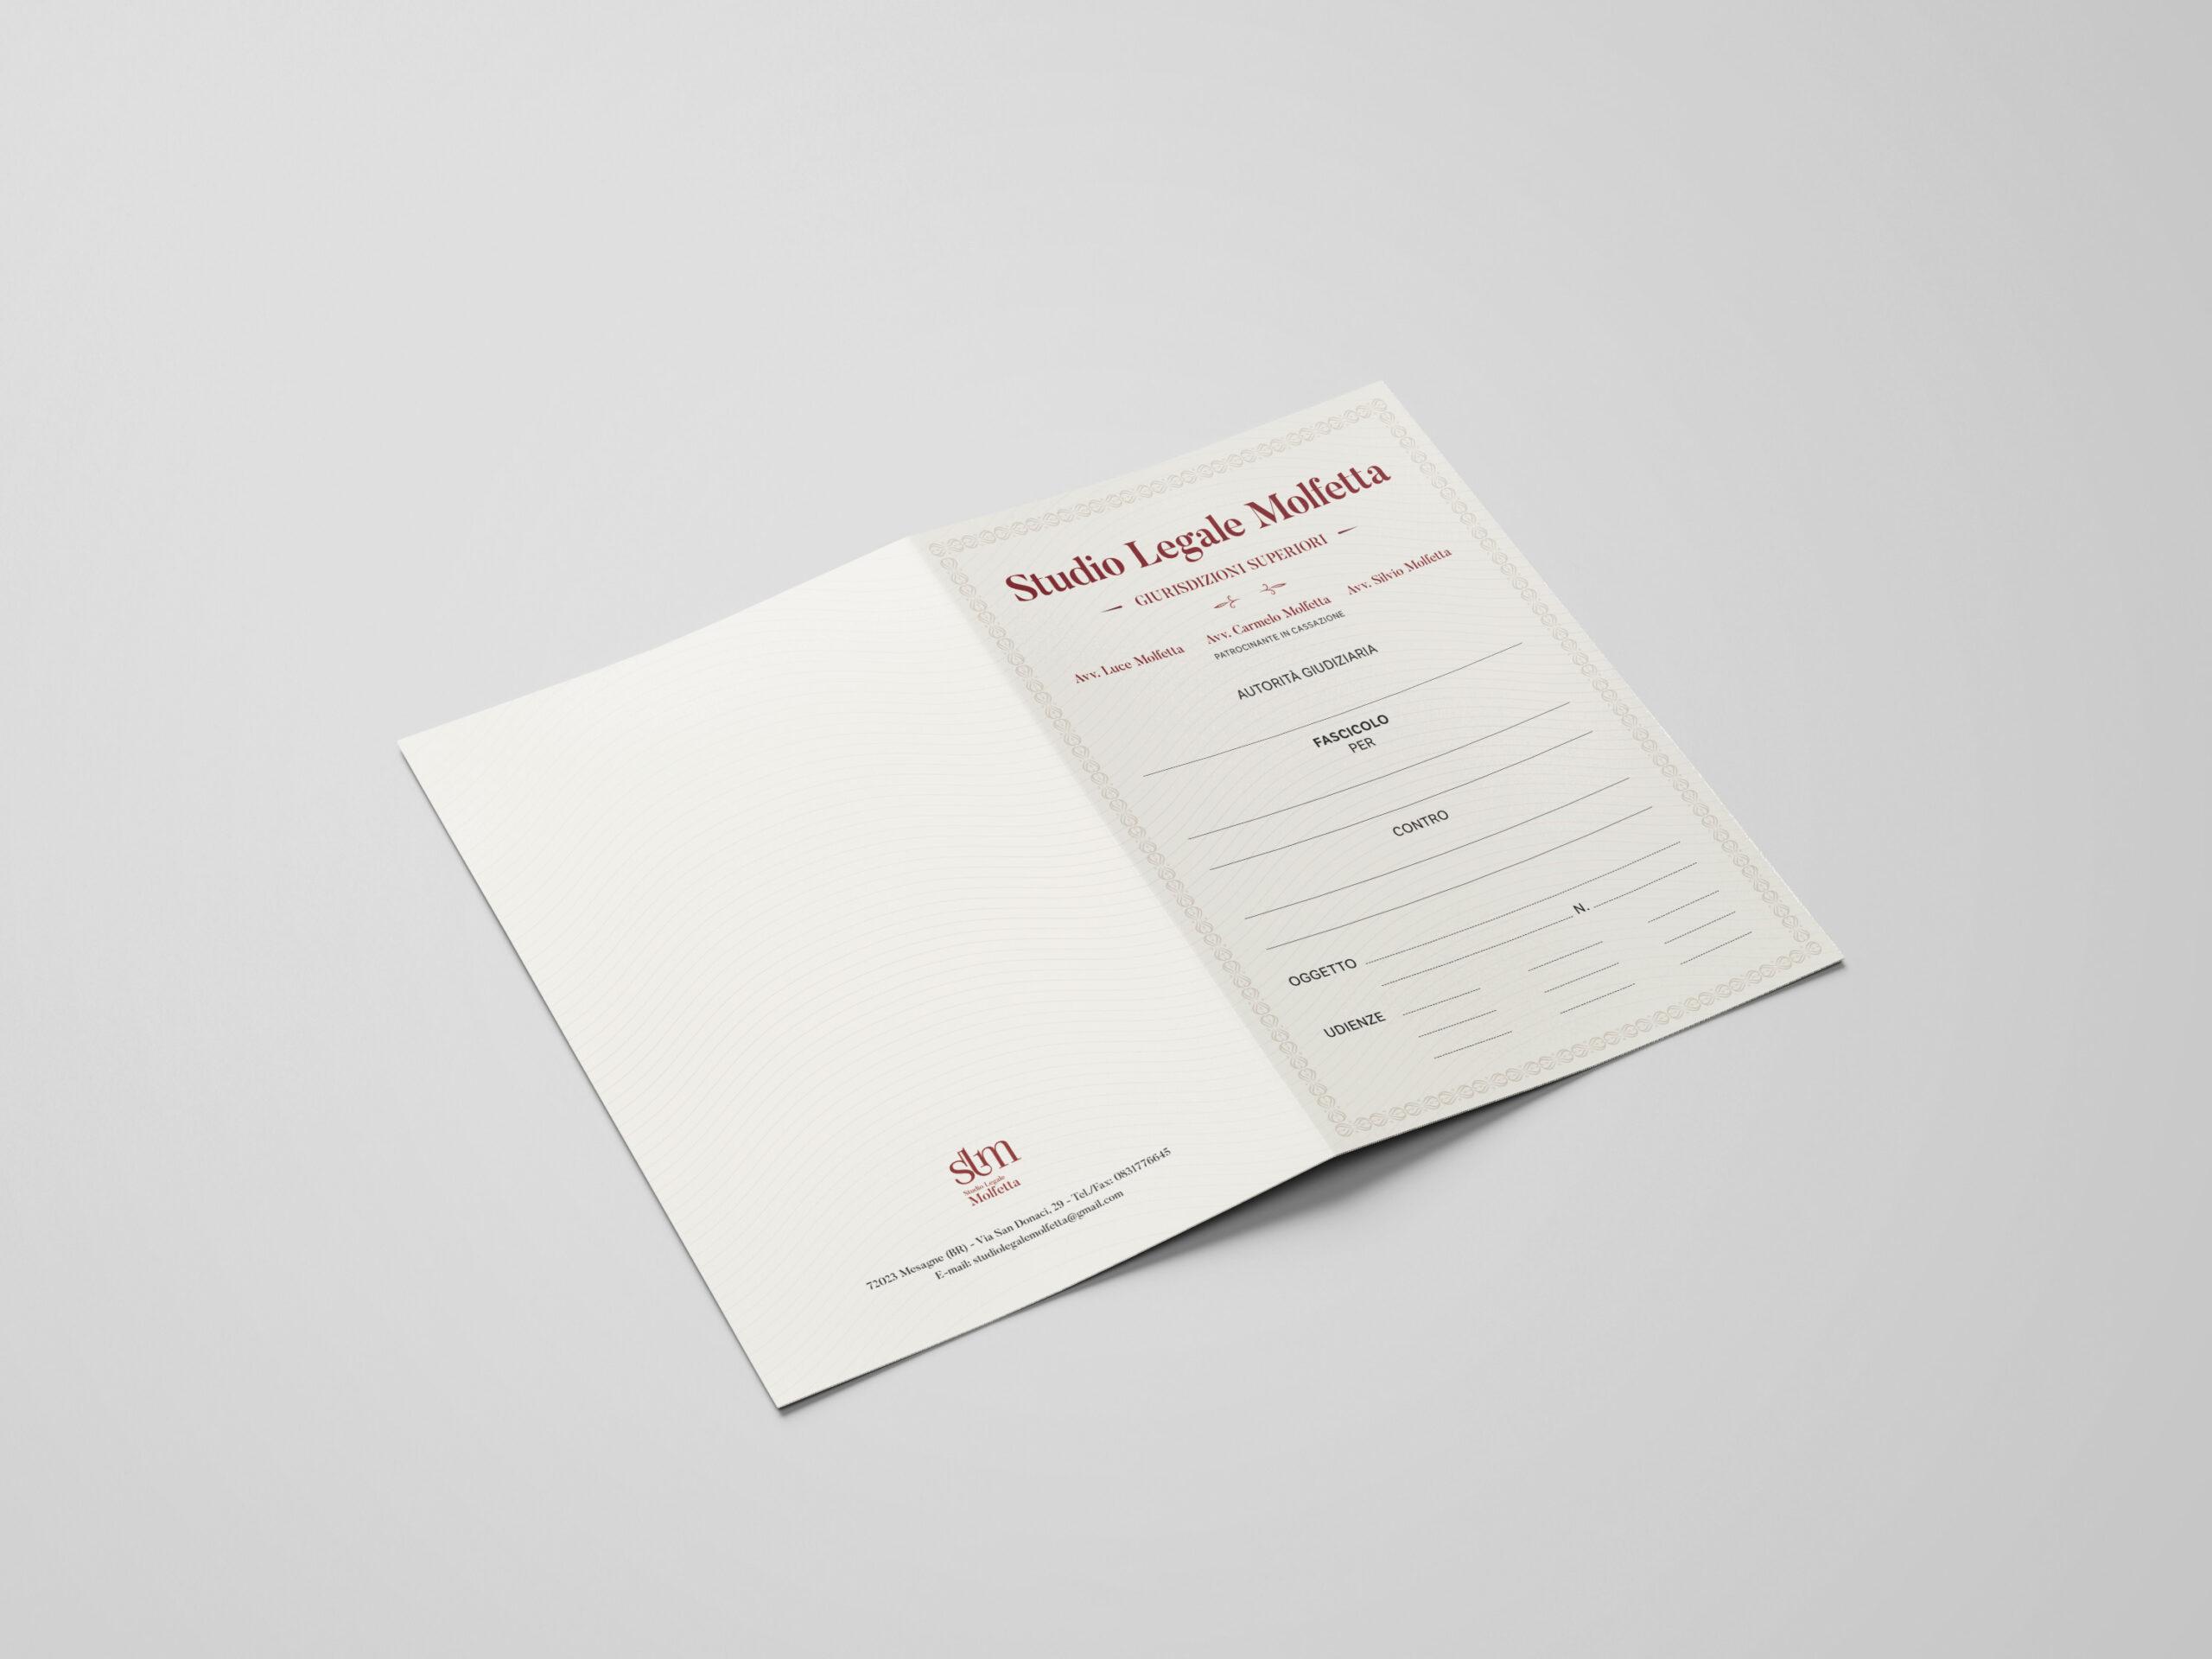 Studio Legale Molfetta - logo, branding, print - img 3